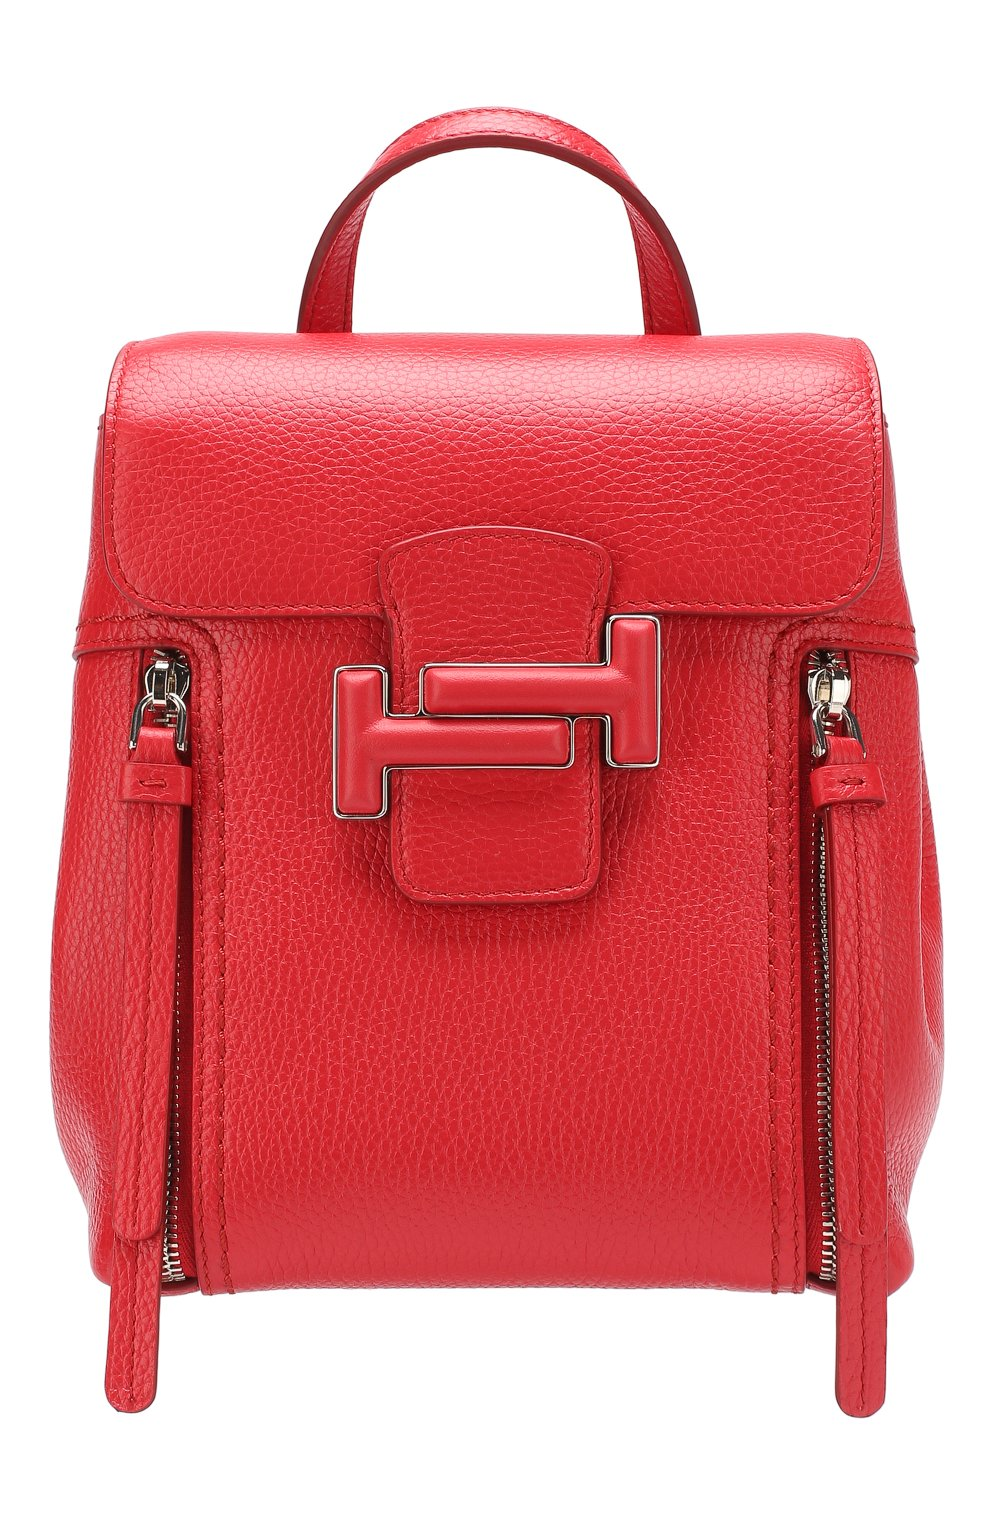 Рюкзак Double T Tod's красный | Фото №1